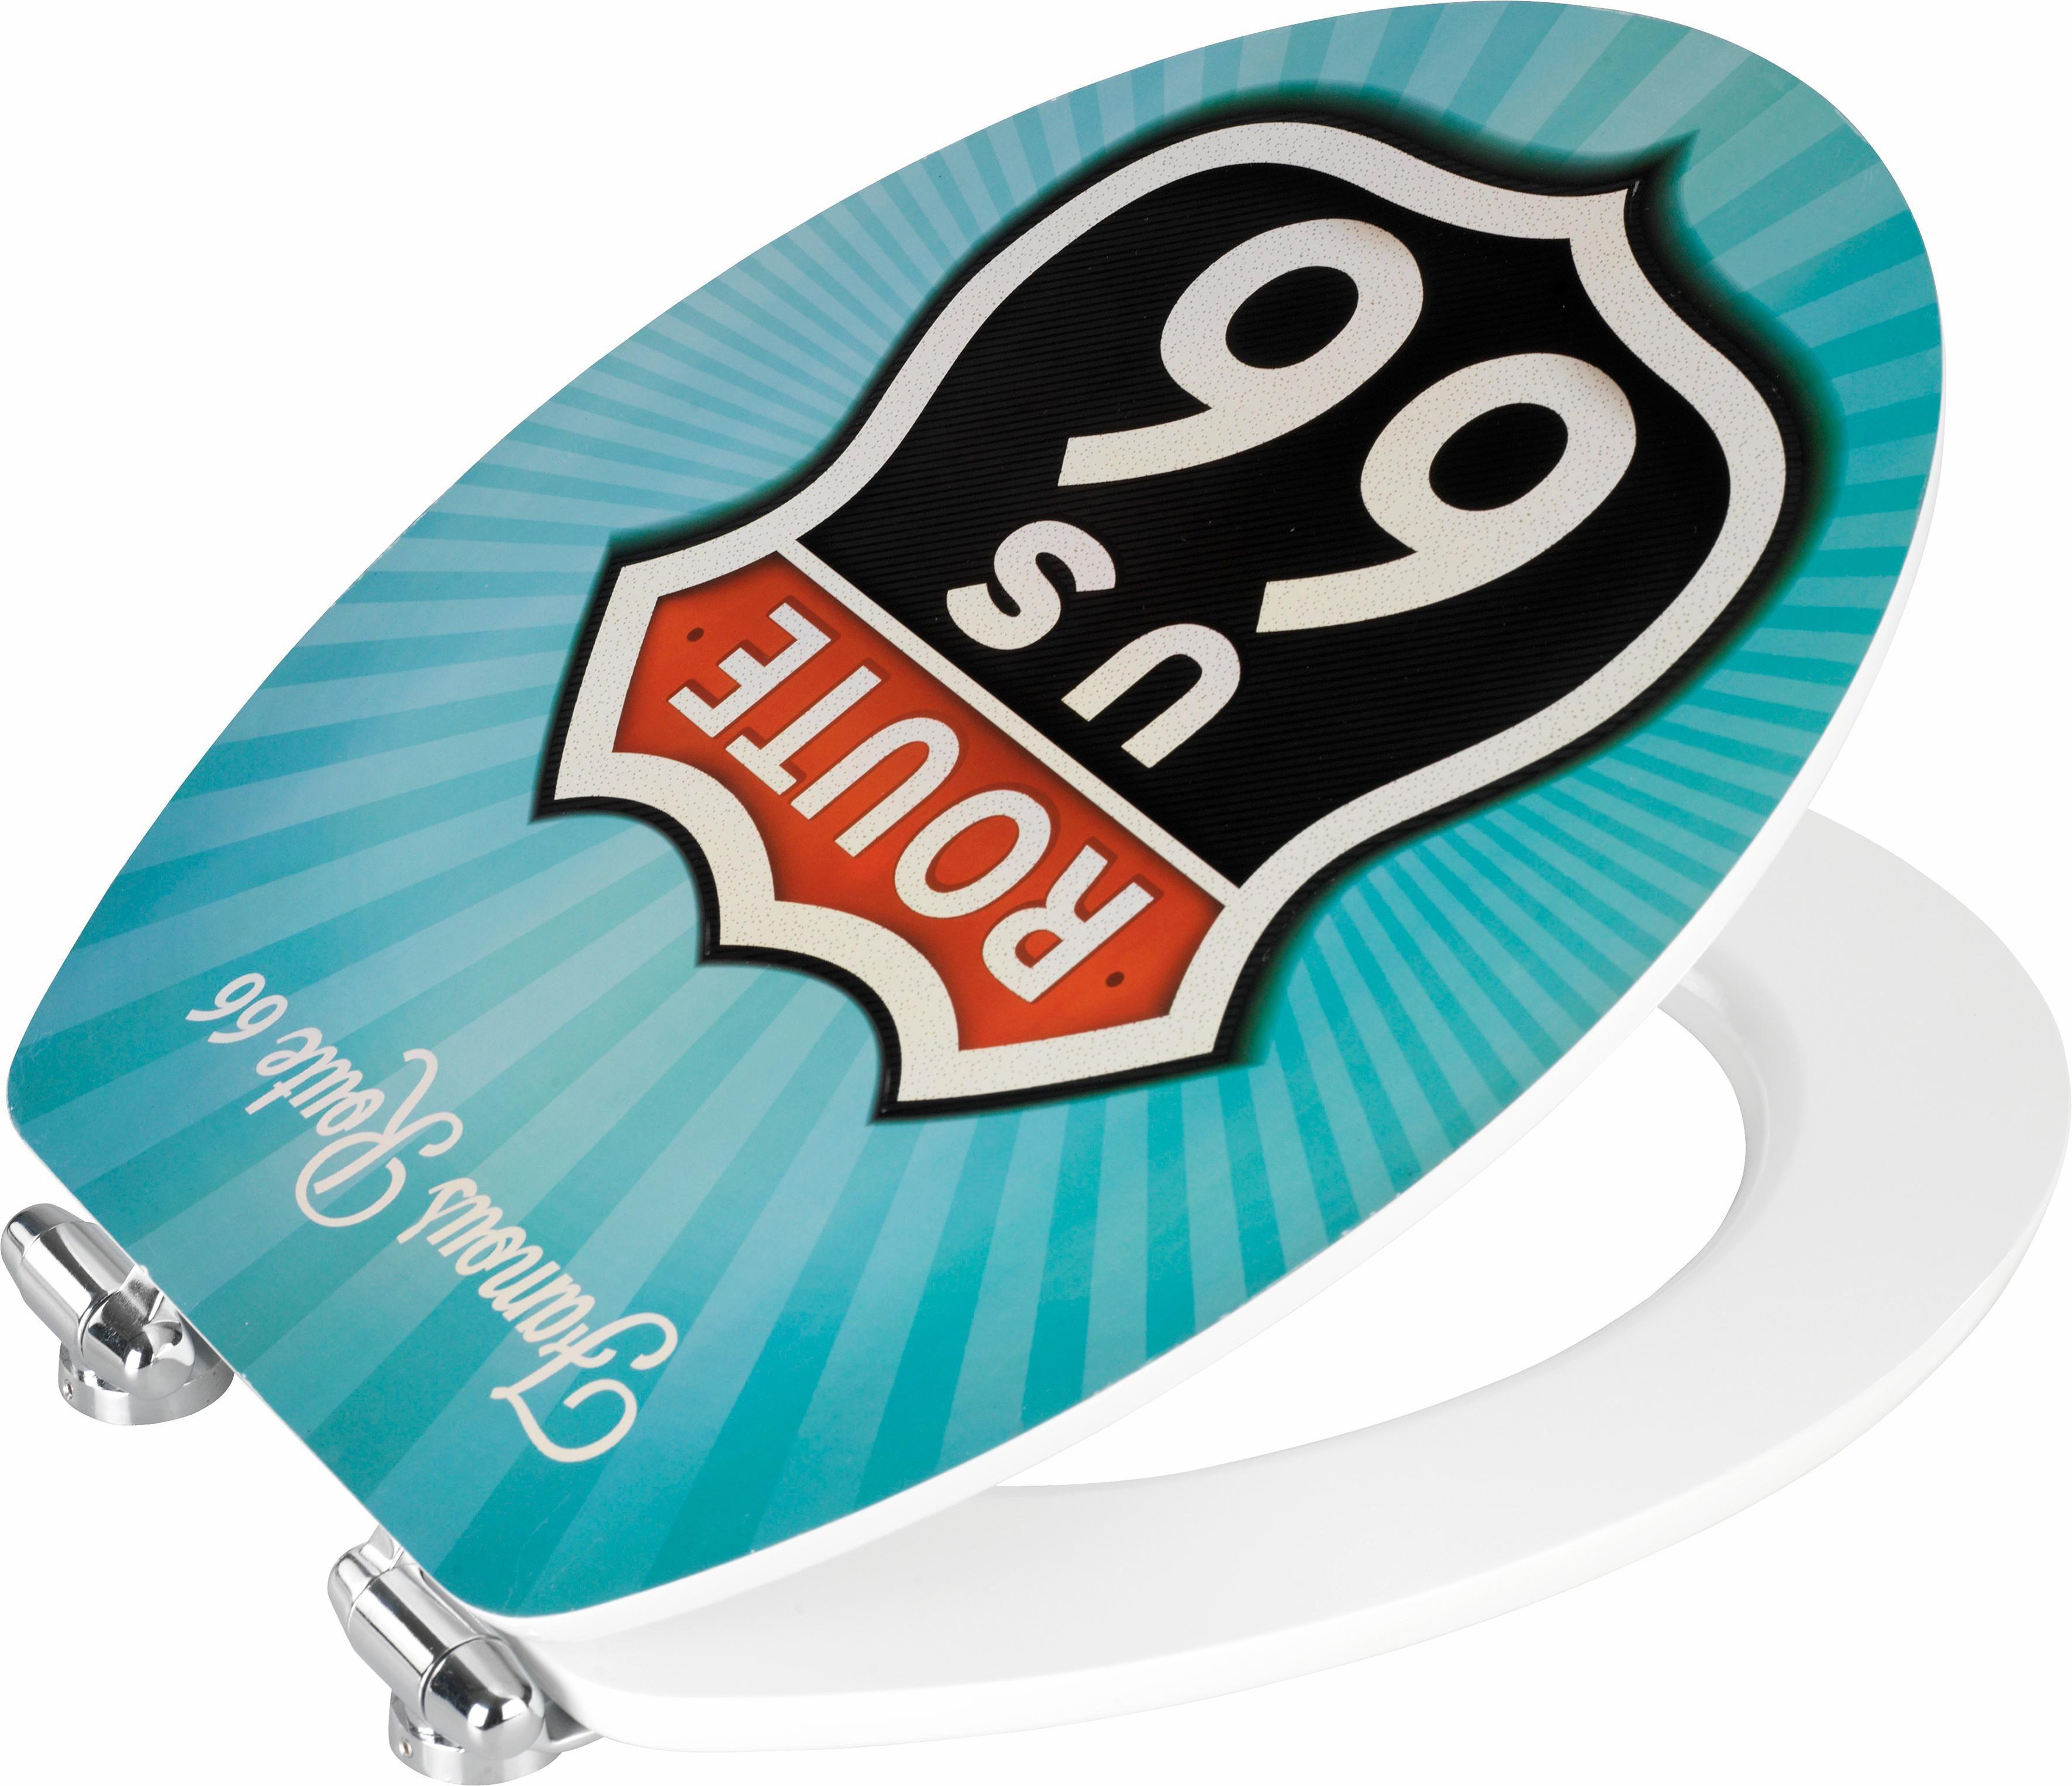 Wenko WC-Sitz Vintage Route 66, Metal Plate Oberfläche, Absenkautomatik